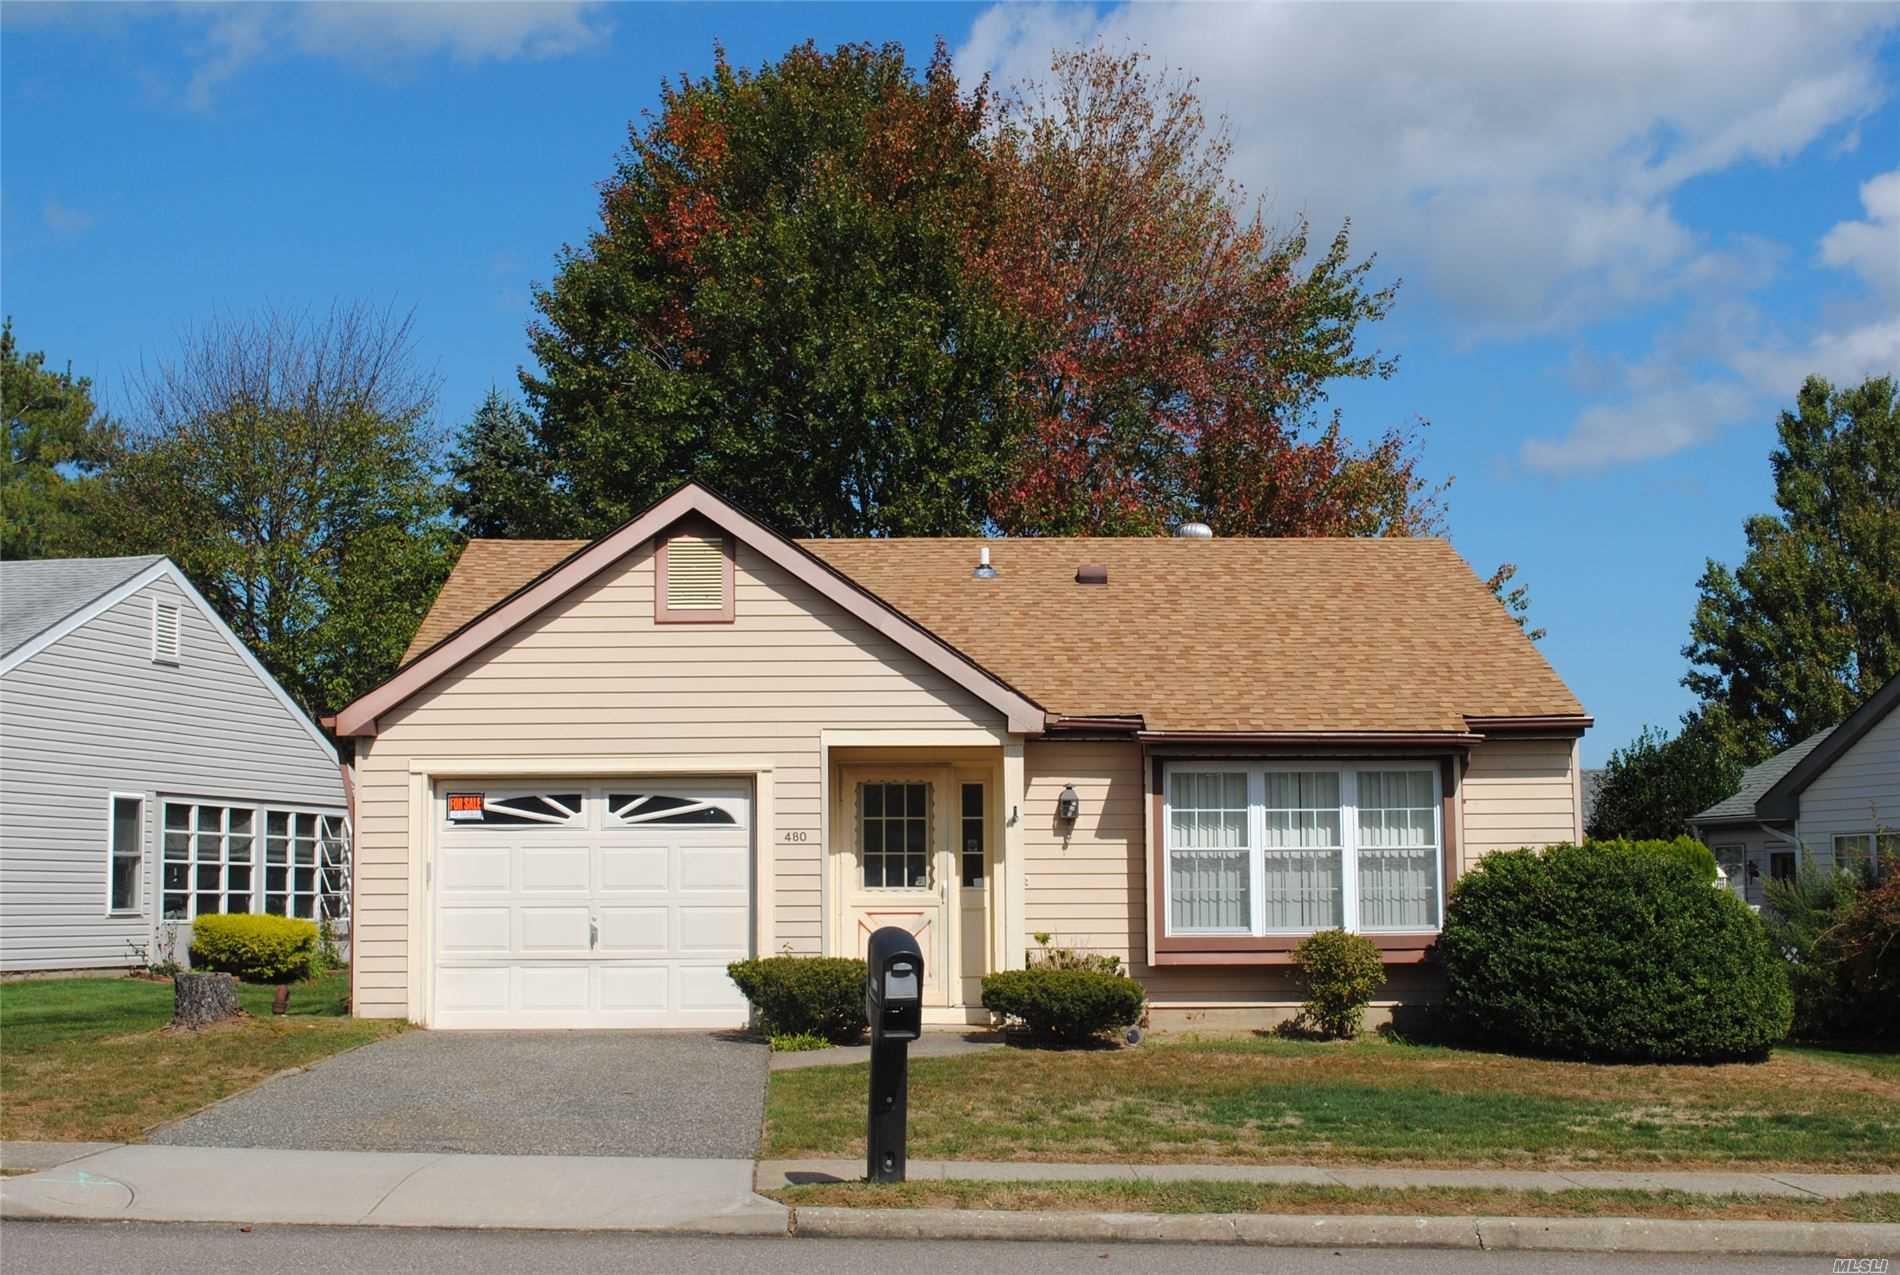 Property for sale at 480 Stratford Lane, Ridge NY 11961, Ridge,  New York 11961